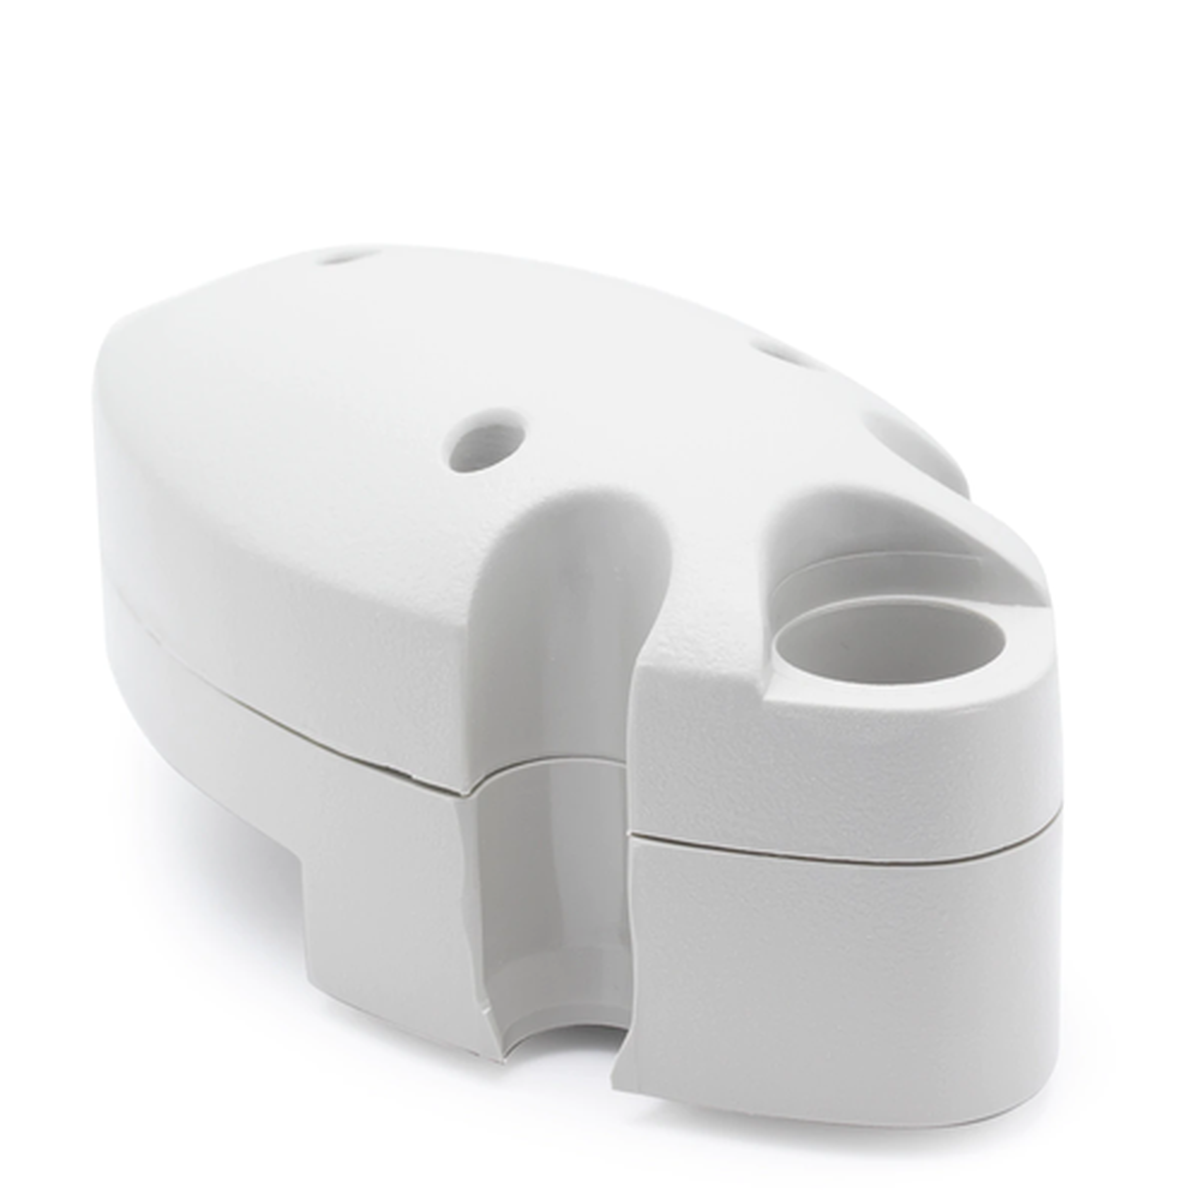 Soporte de Electrodo Superior - HI900310